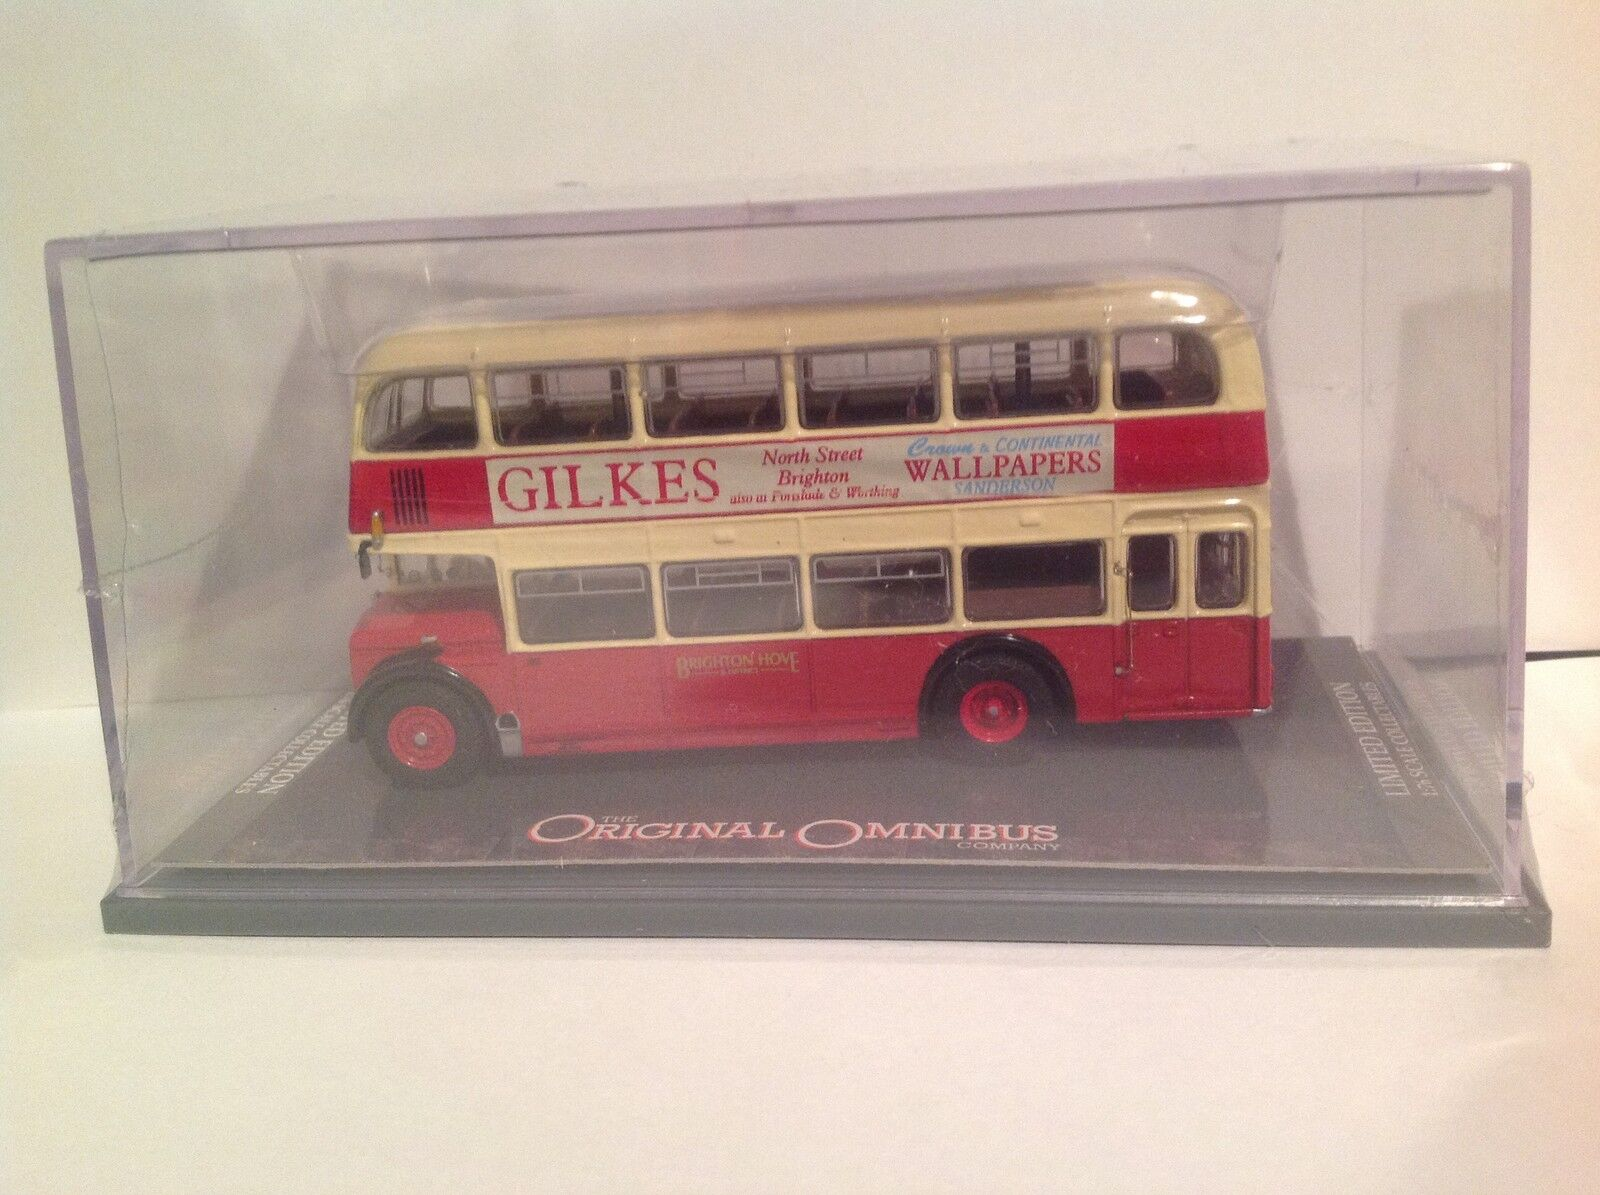 Corgi OM40802 Bristol Bristol Bristol Lodekka FS-Brighton & Hove distrito Ltd ómnibus Co. Ltd. 067d93